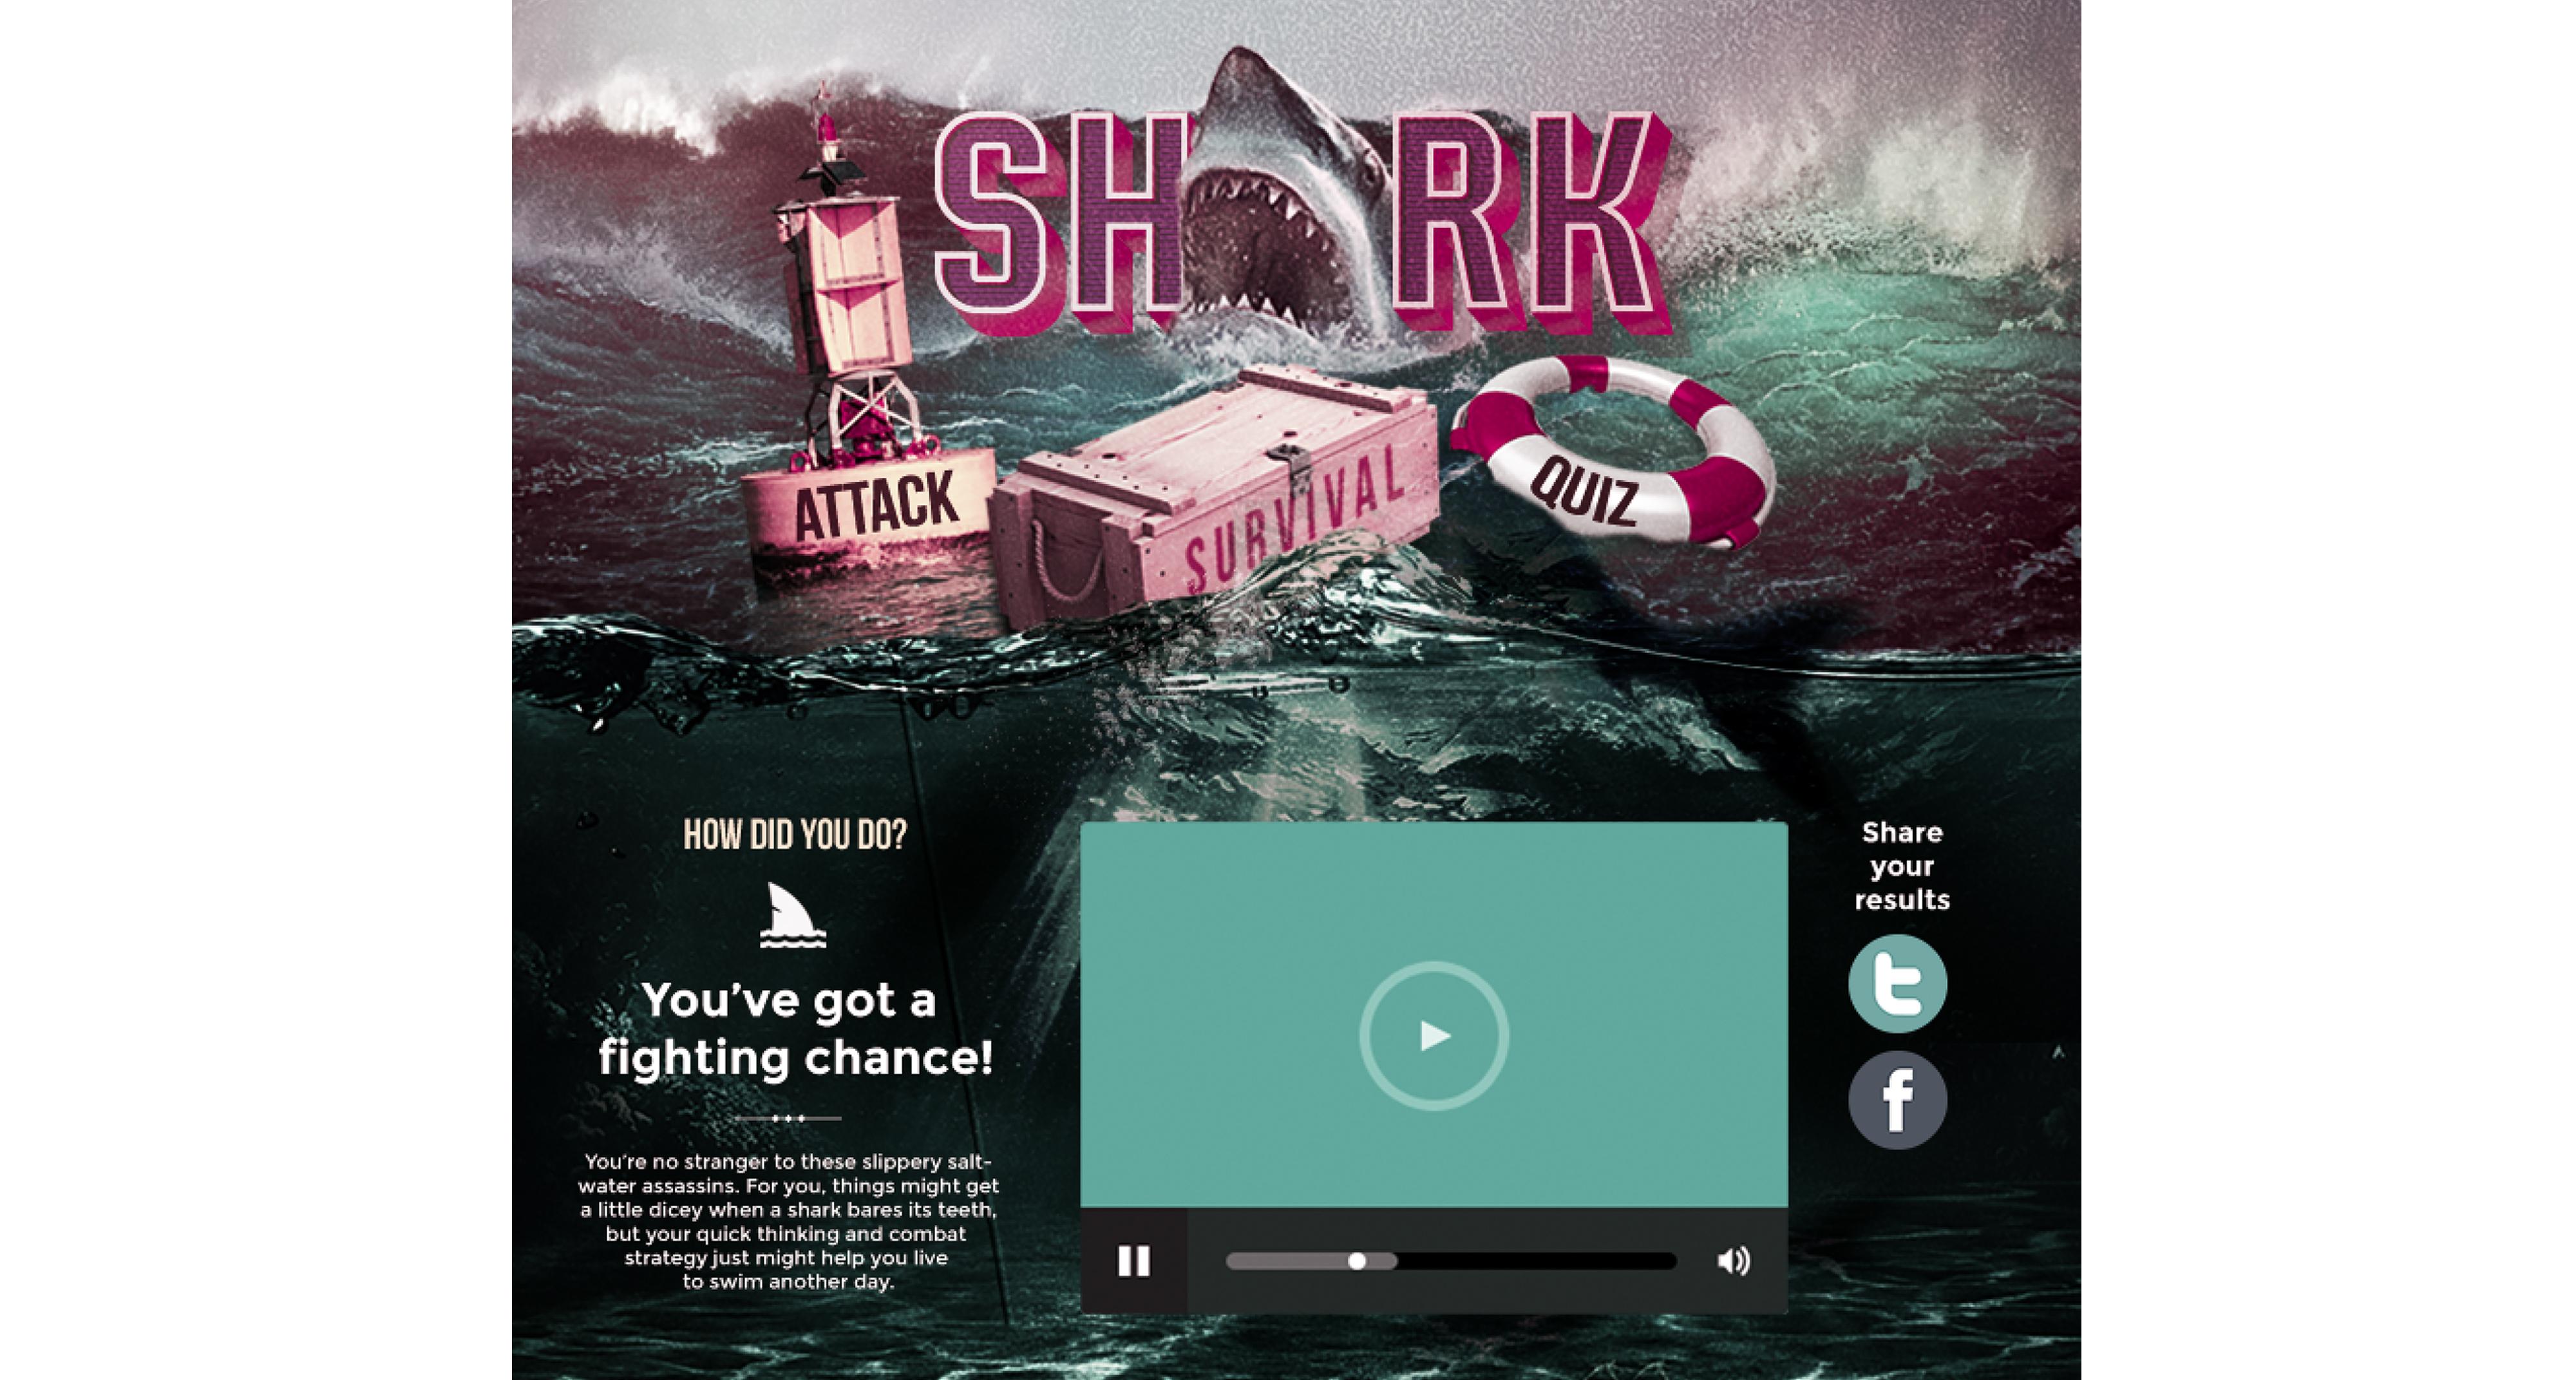 shark_r2